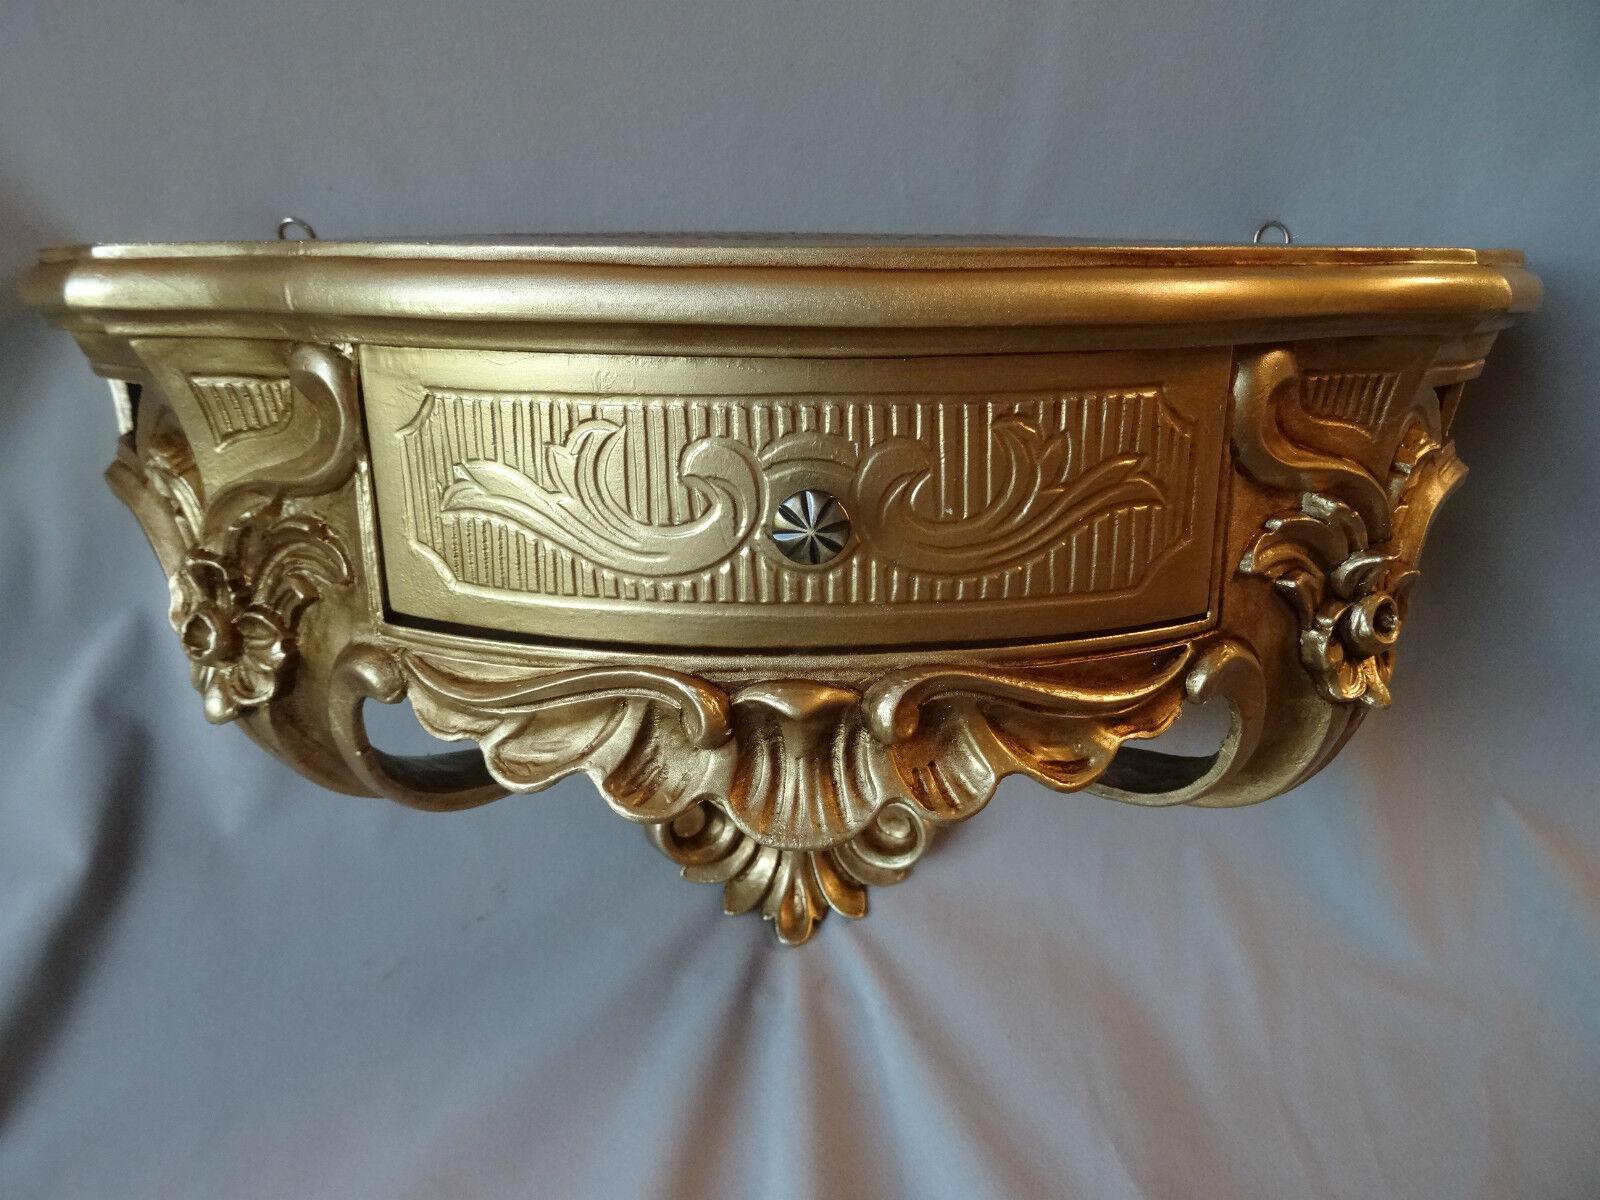 wandkonsole mit schublade spiegelkonsole wandregal barock gold 50x27 antik cp84 eur 69 90. Black Bedroom Furniture Sets. Home Design Ideas